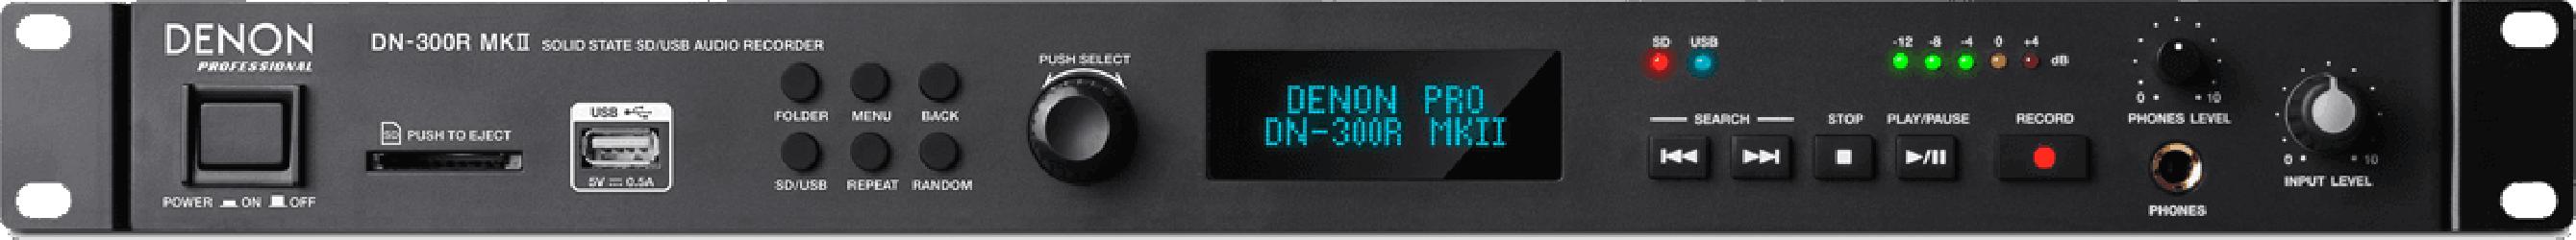 Enregistreur SD/USB profesionnel Denon DN300RMKII